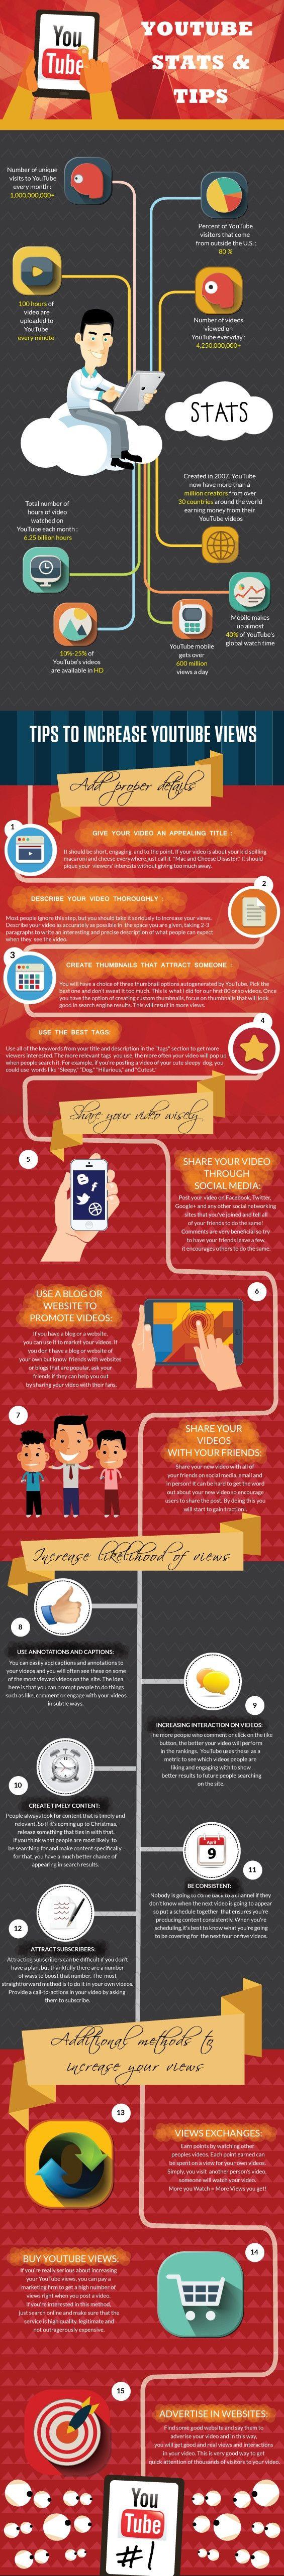 Start Your Online Marketing Using YouTube #infographic #YouTube #SocialMedia